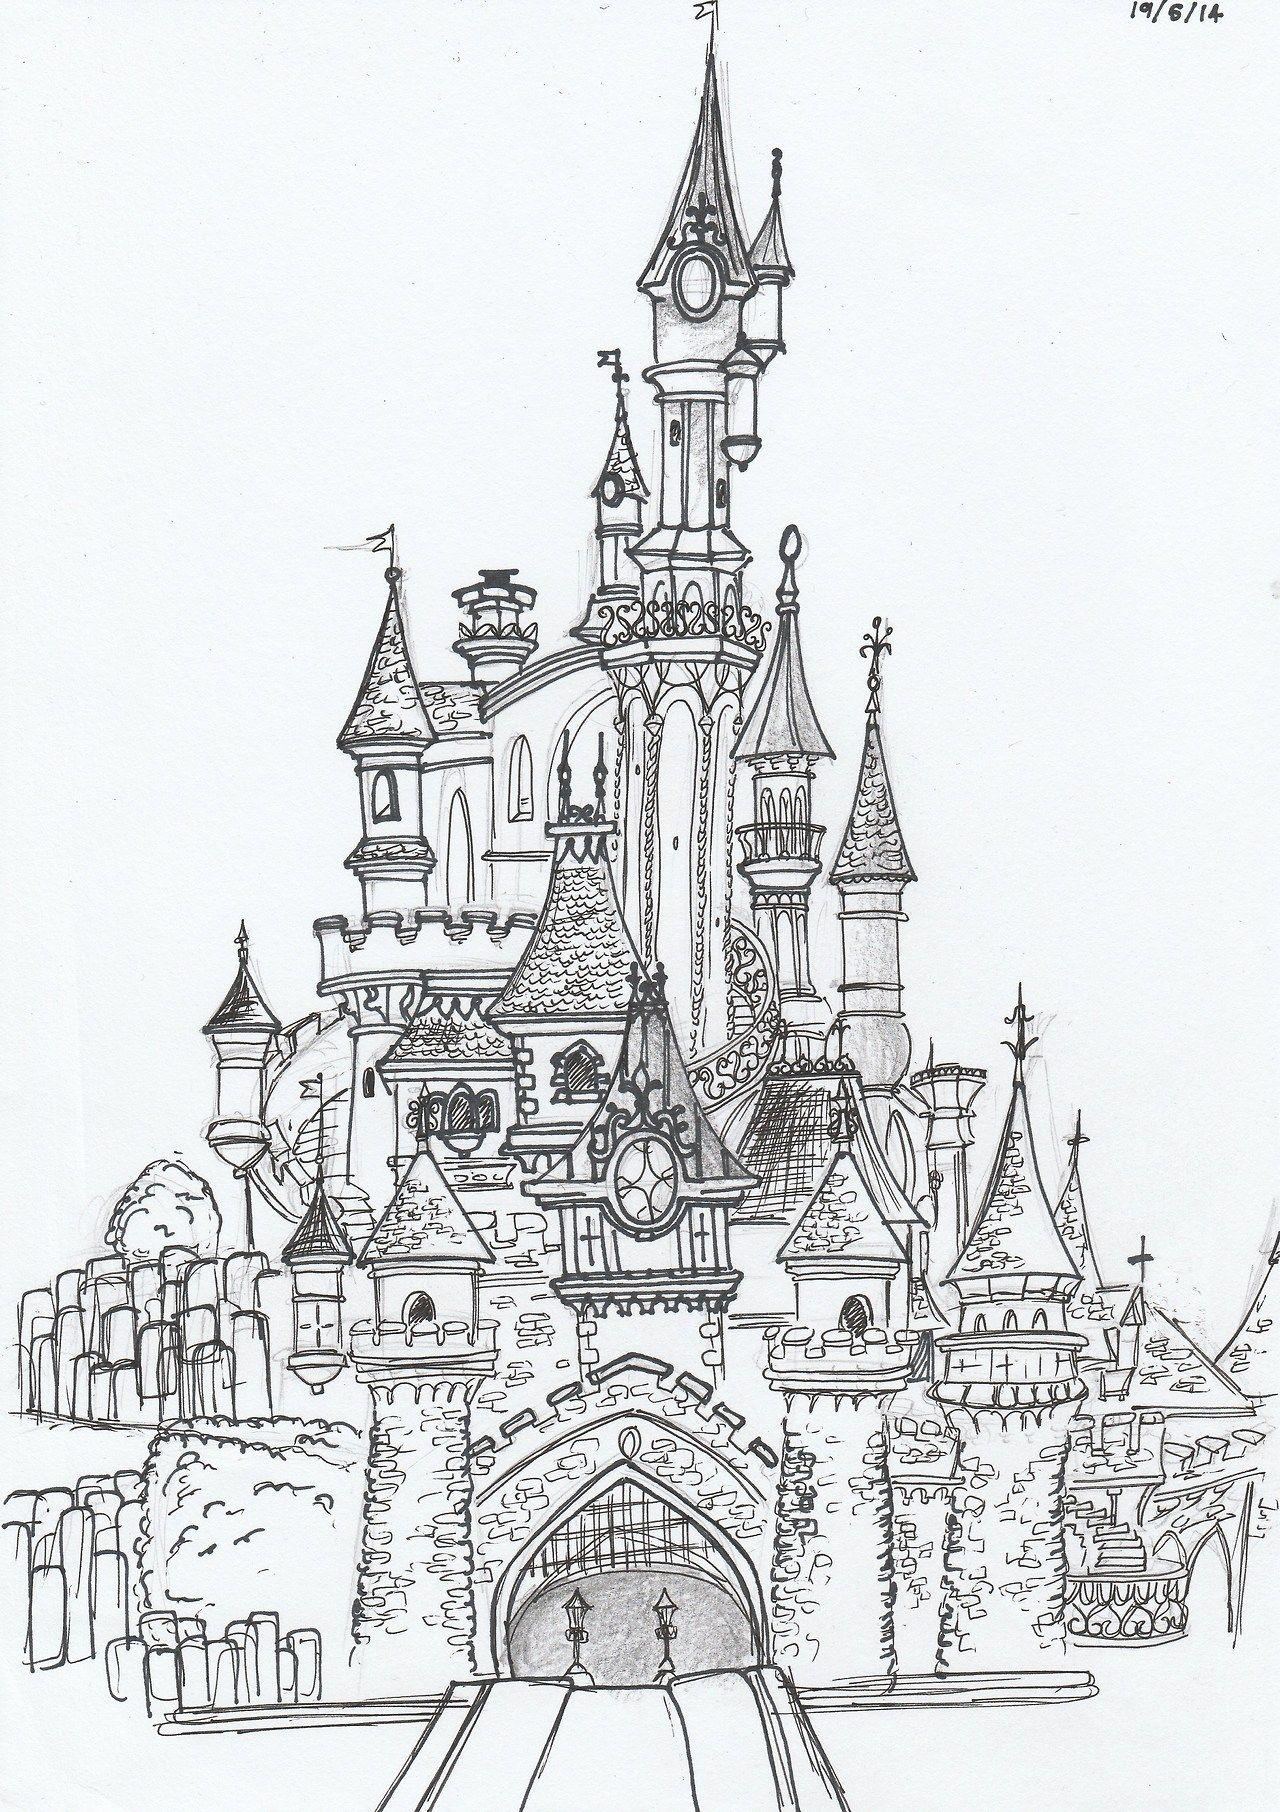 Pin De Lerochka778 Em Domiki Desenho De Castelo Castelo